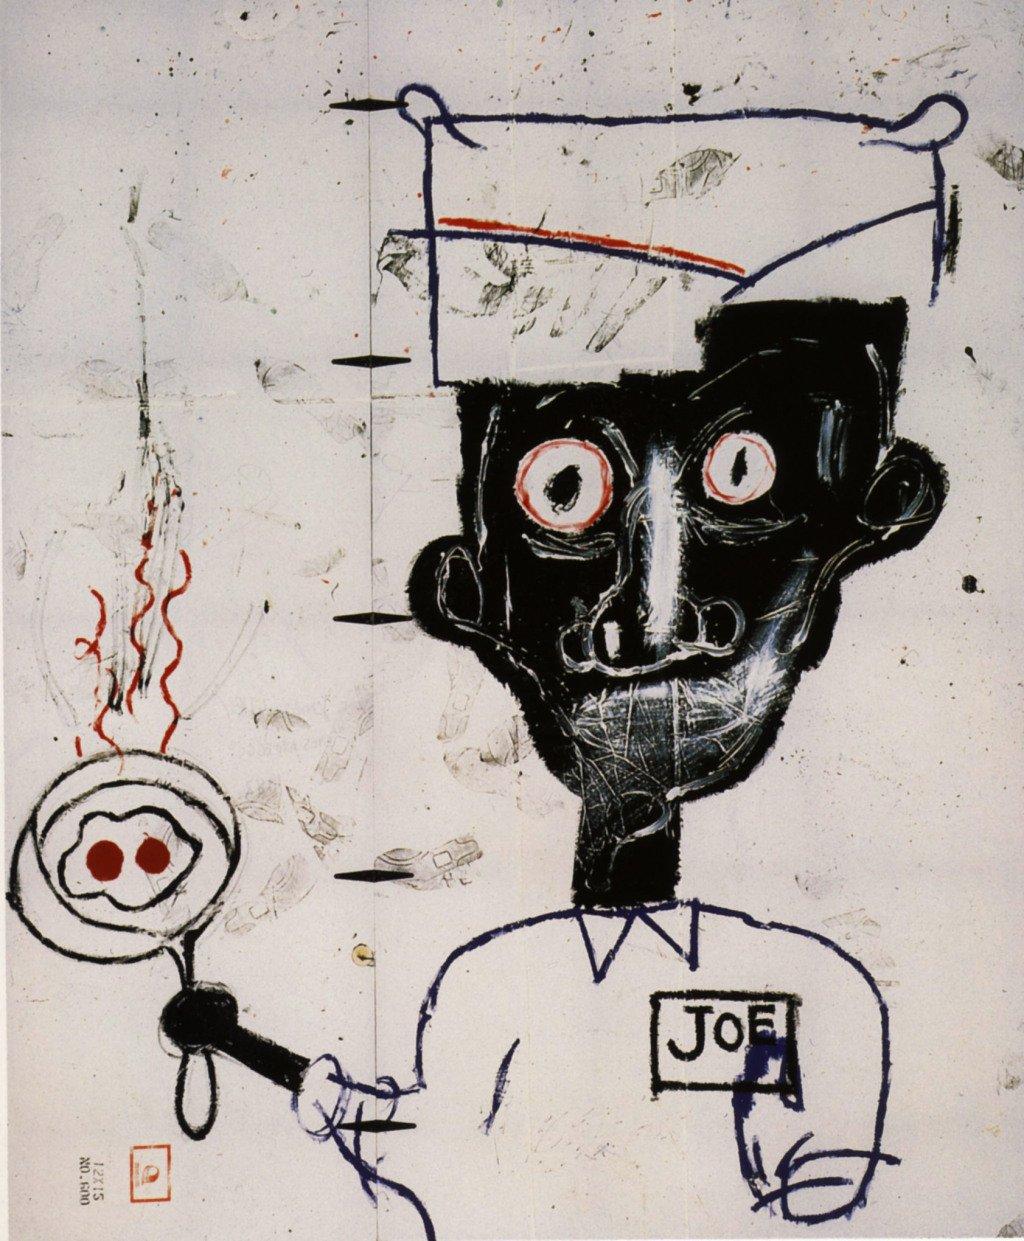 Eyes and Eggs — Jean-MichelBasquiat https://t.co/pLhURgxuXt https://t.co/jkXO0Ya9c9